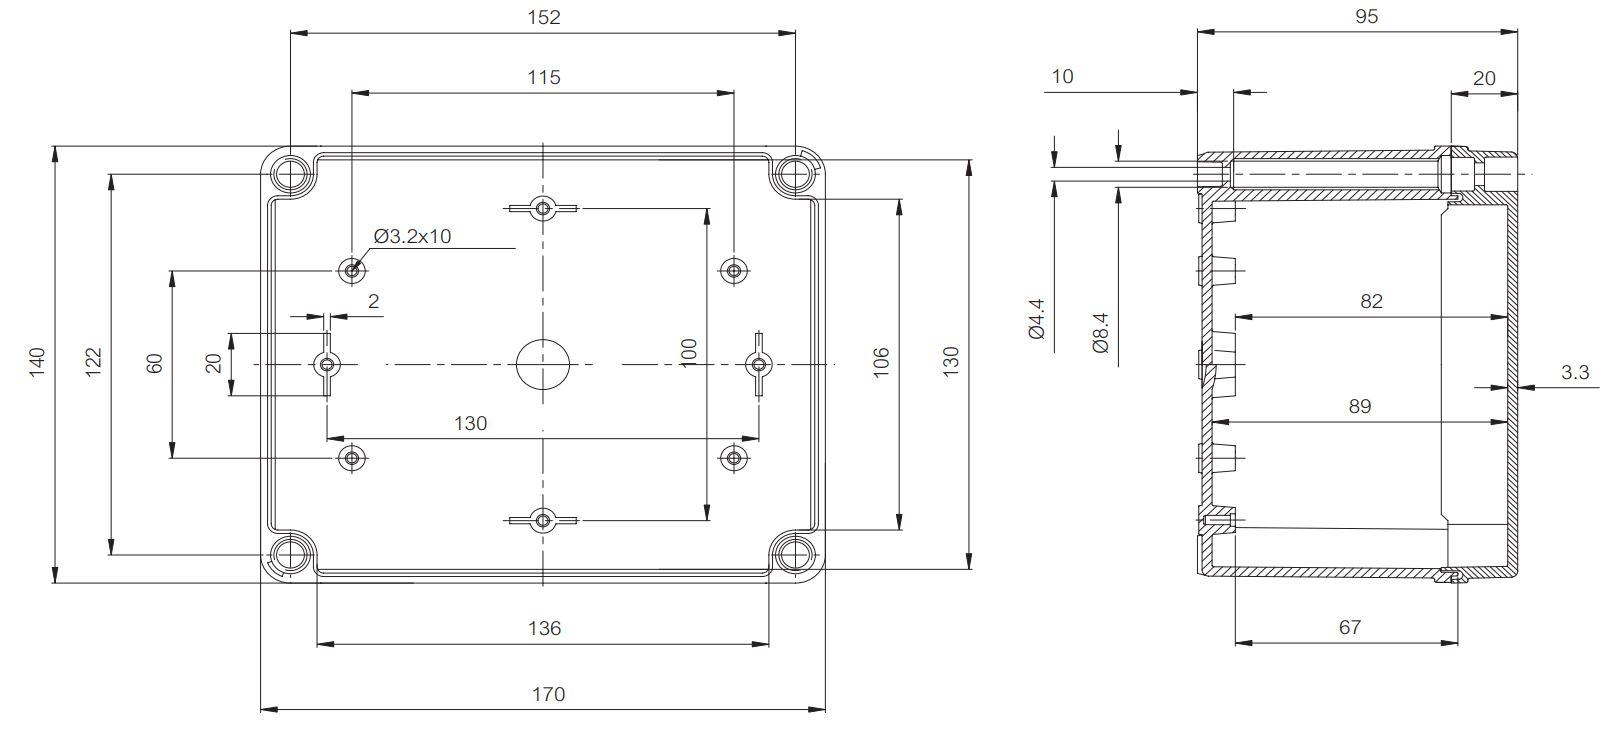 hight resolution of bmv 700h shunt box